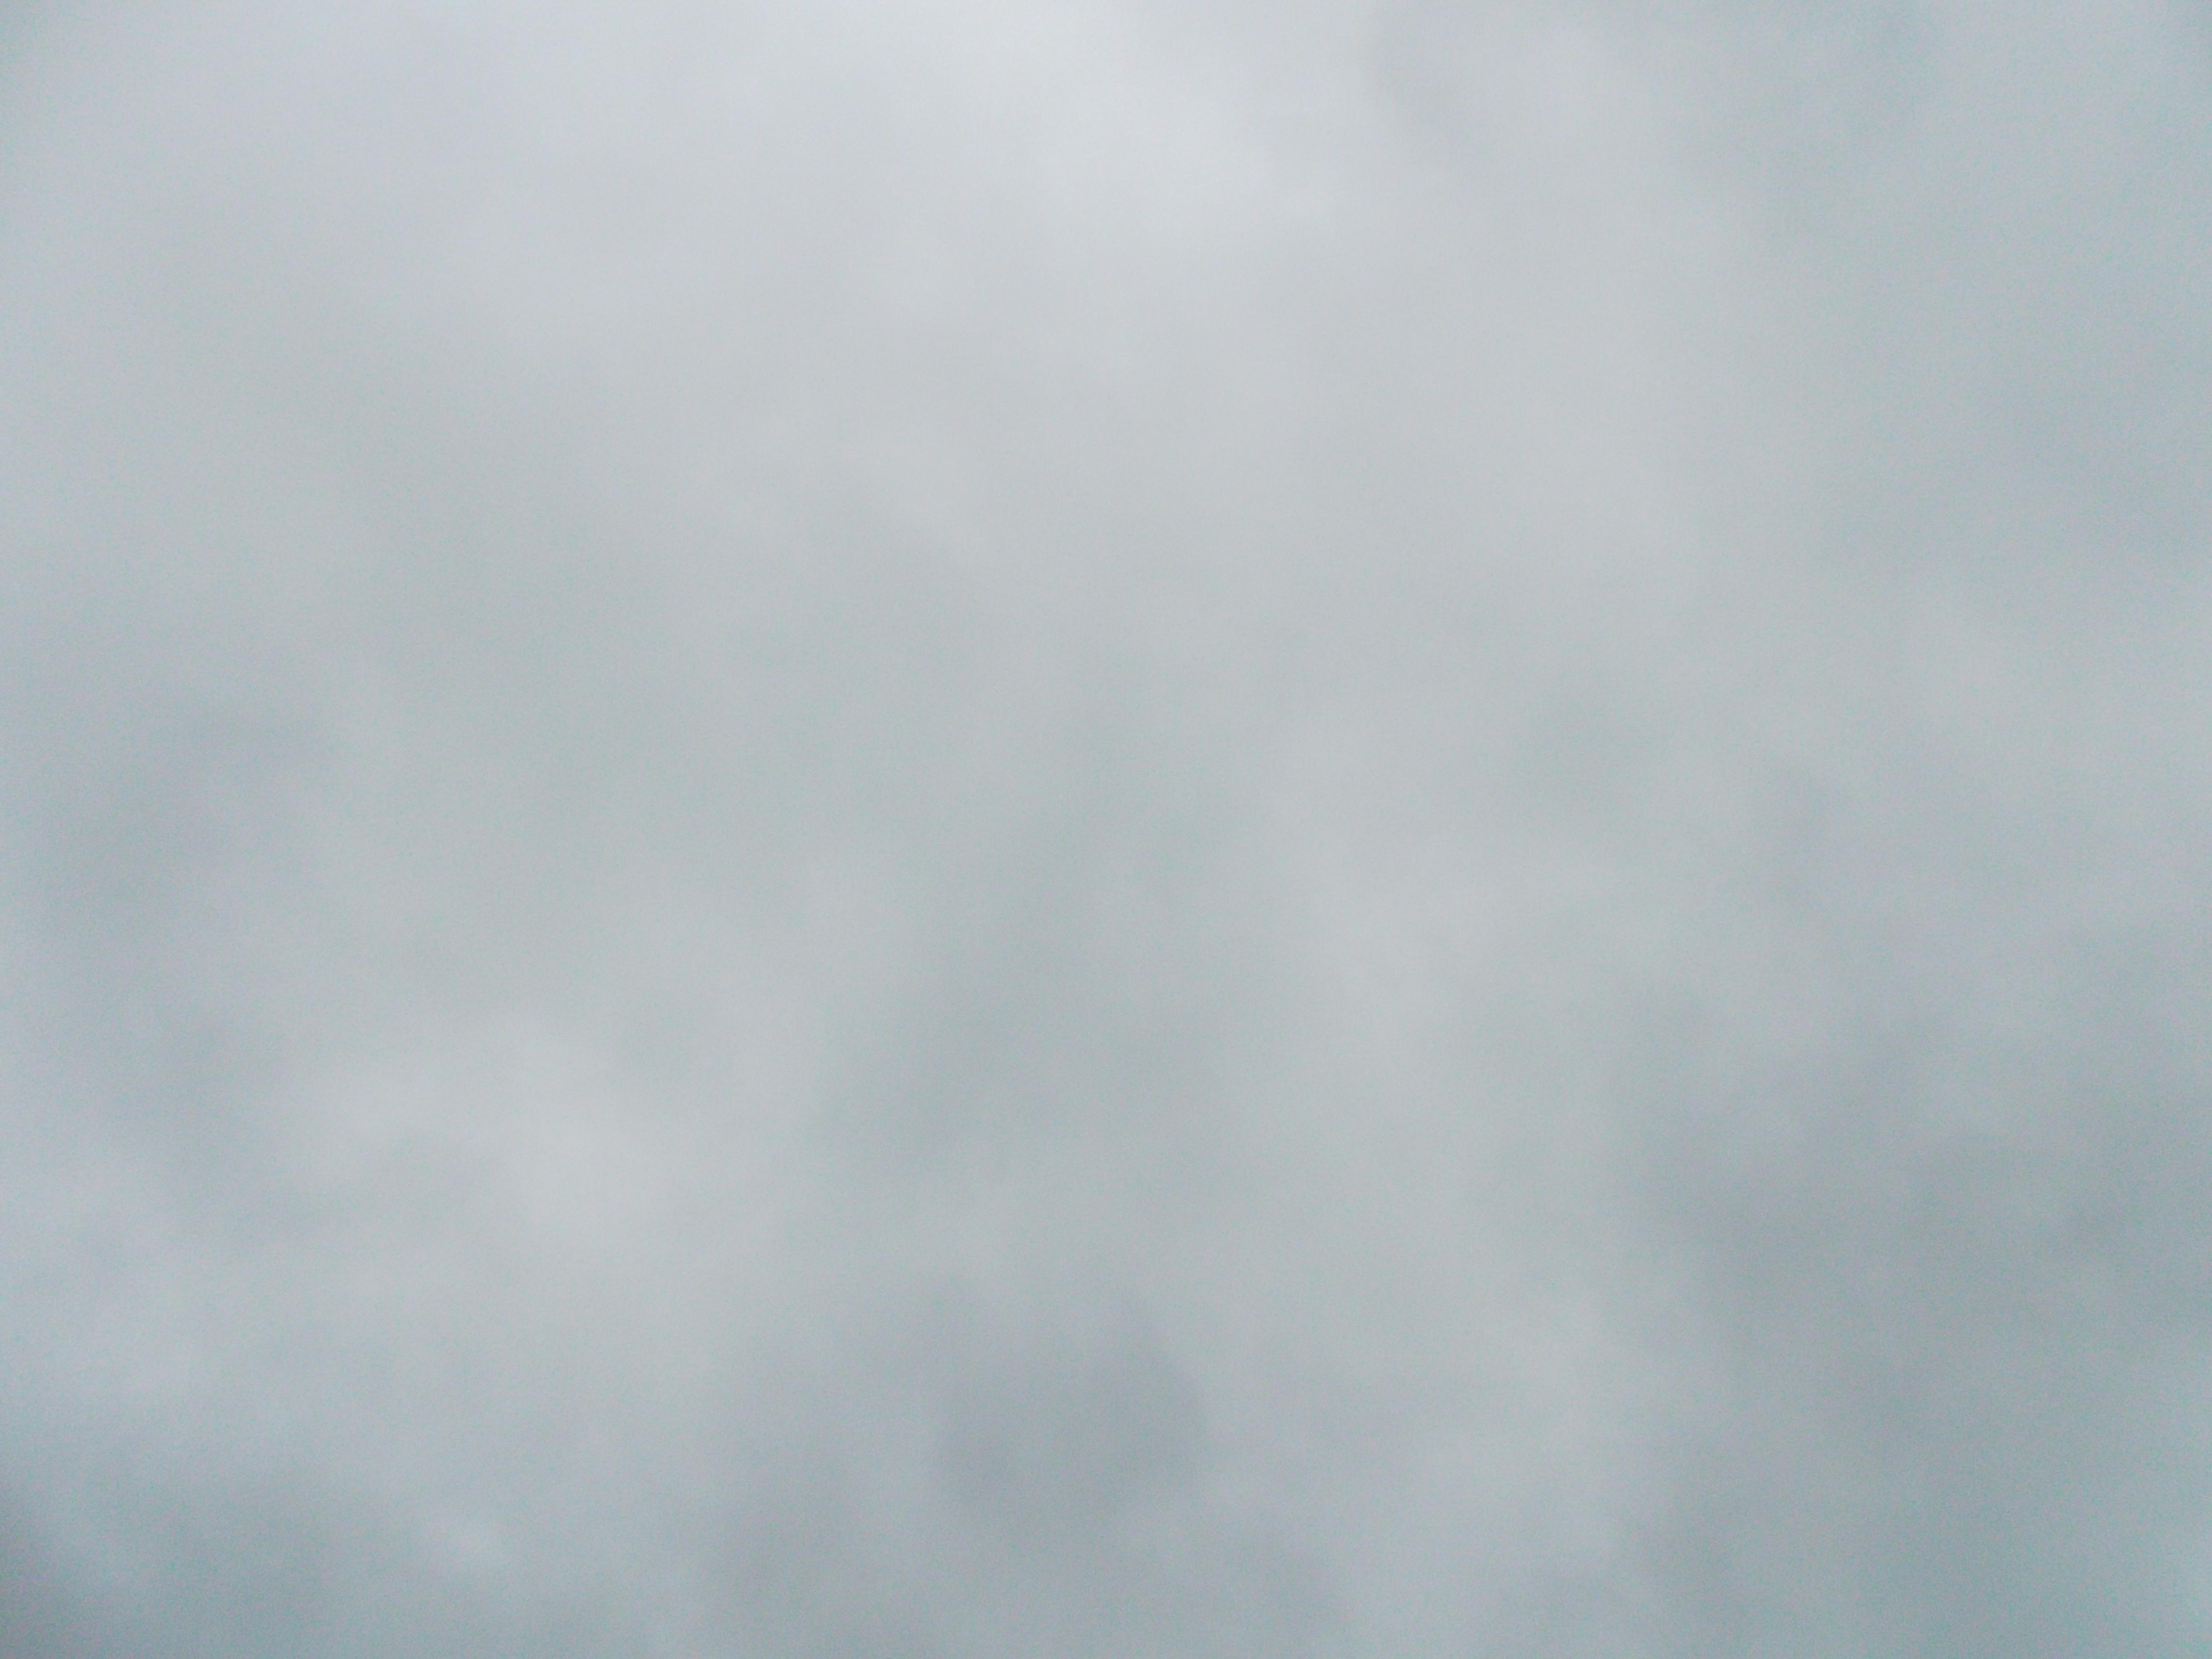 2013-04-16 Longitude -0.371 Latitude 49.182 Altitude 29 Heure 11h33